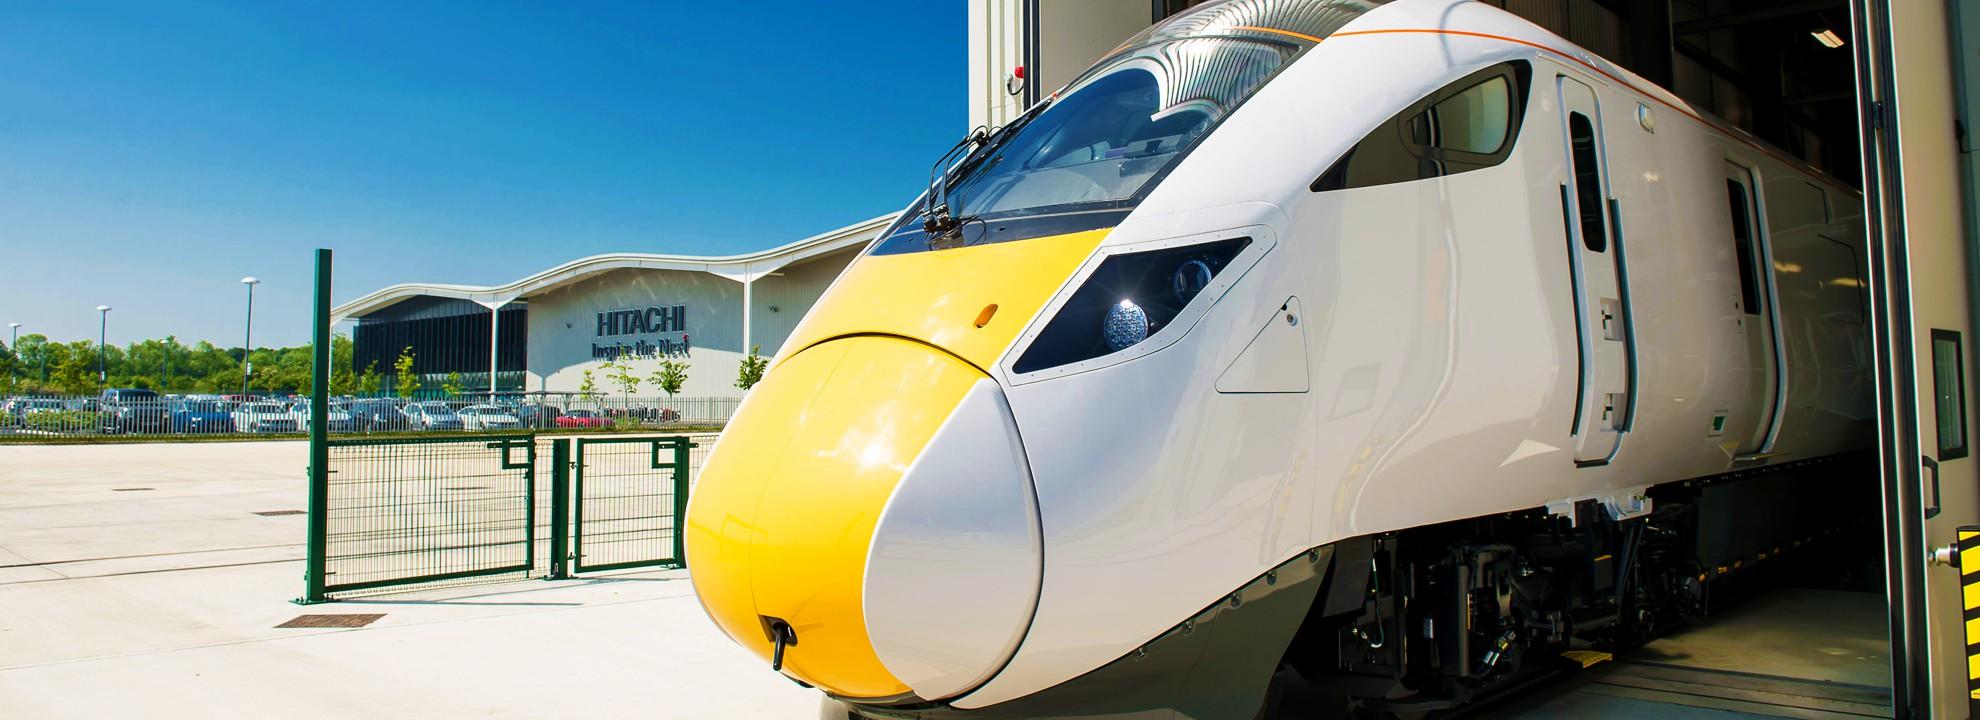 Hitachi train leaving factory building UK